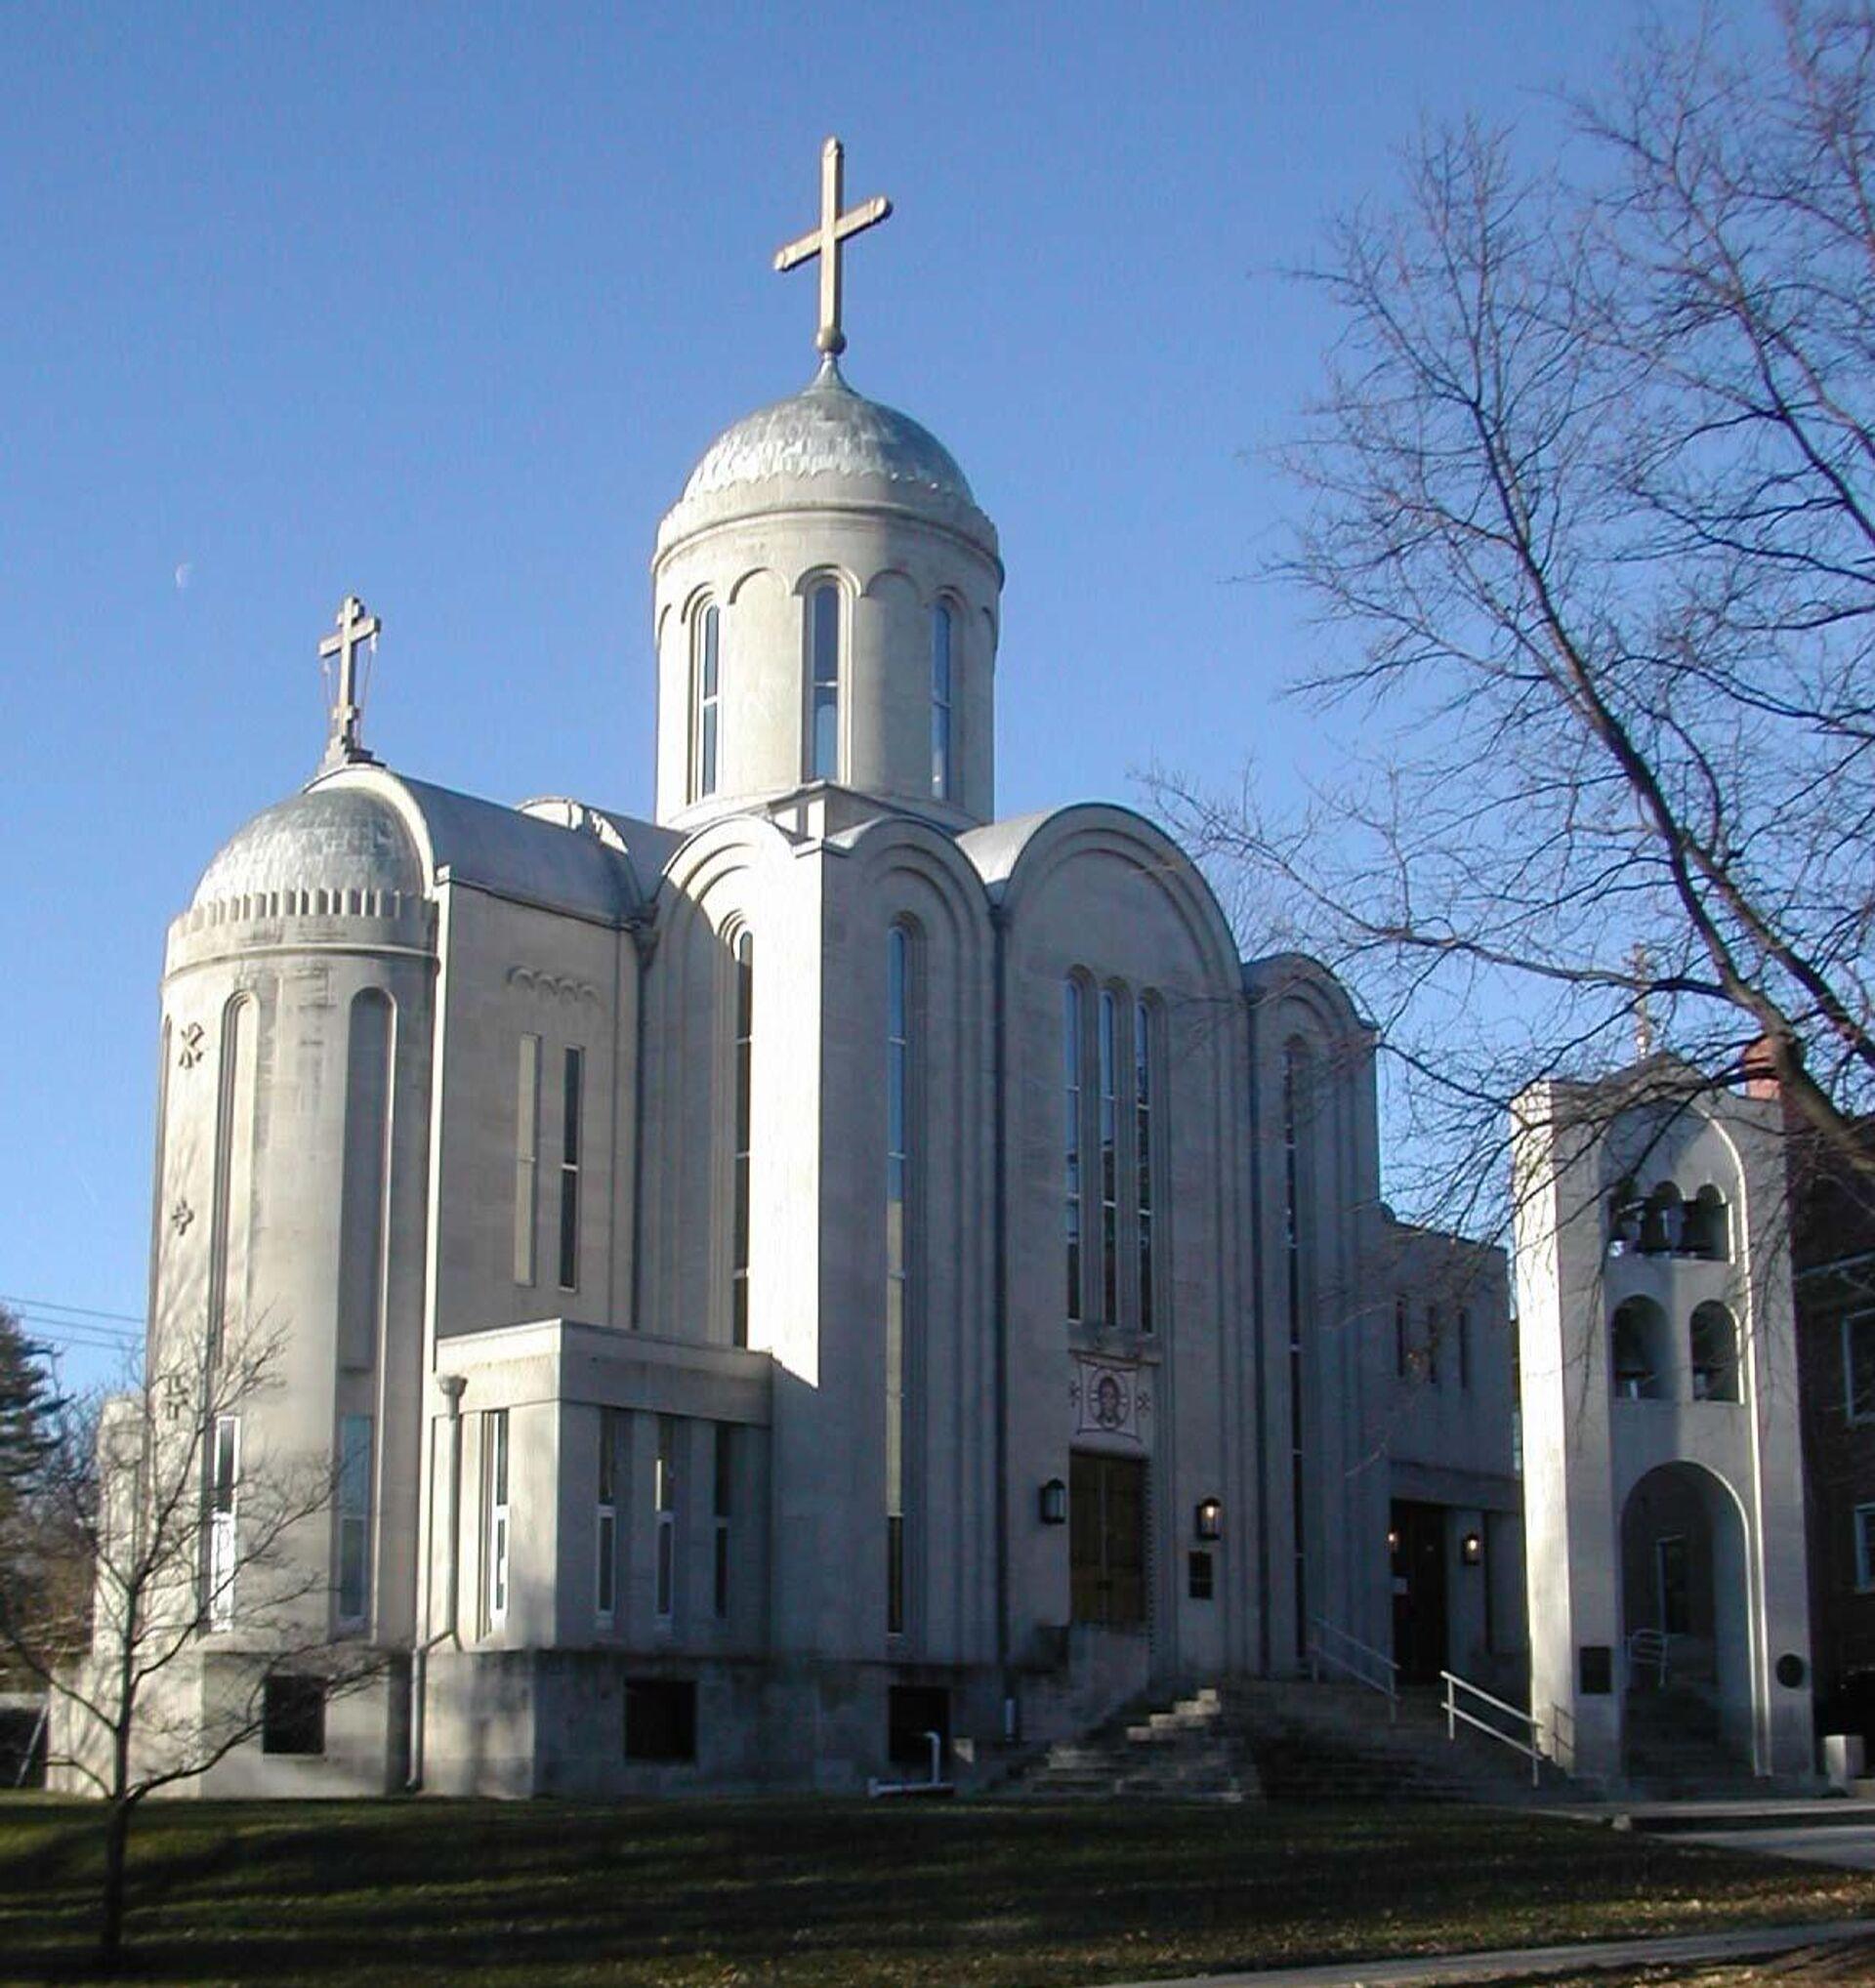 Свято-Николаевский собор в Вашингтоне - РИА Новости, 1920, 13.04.2021